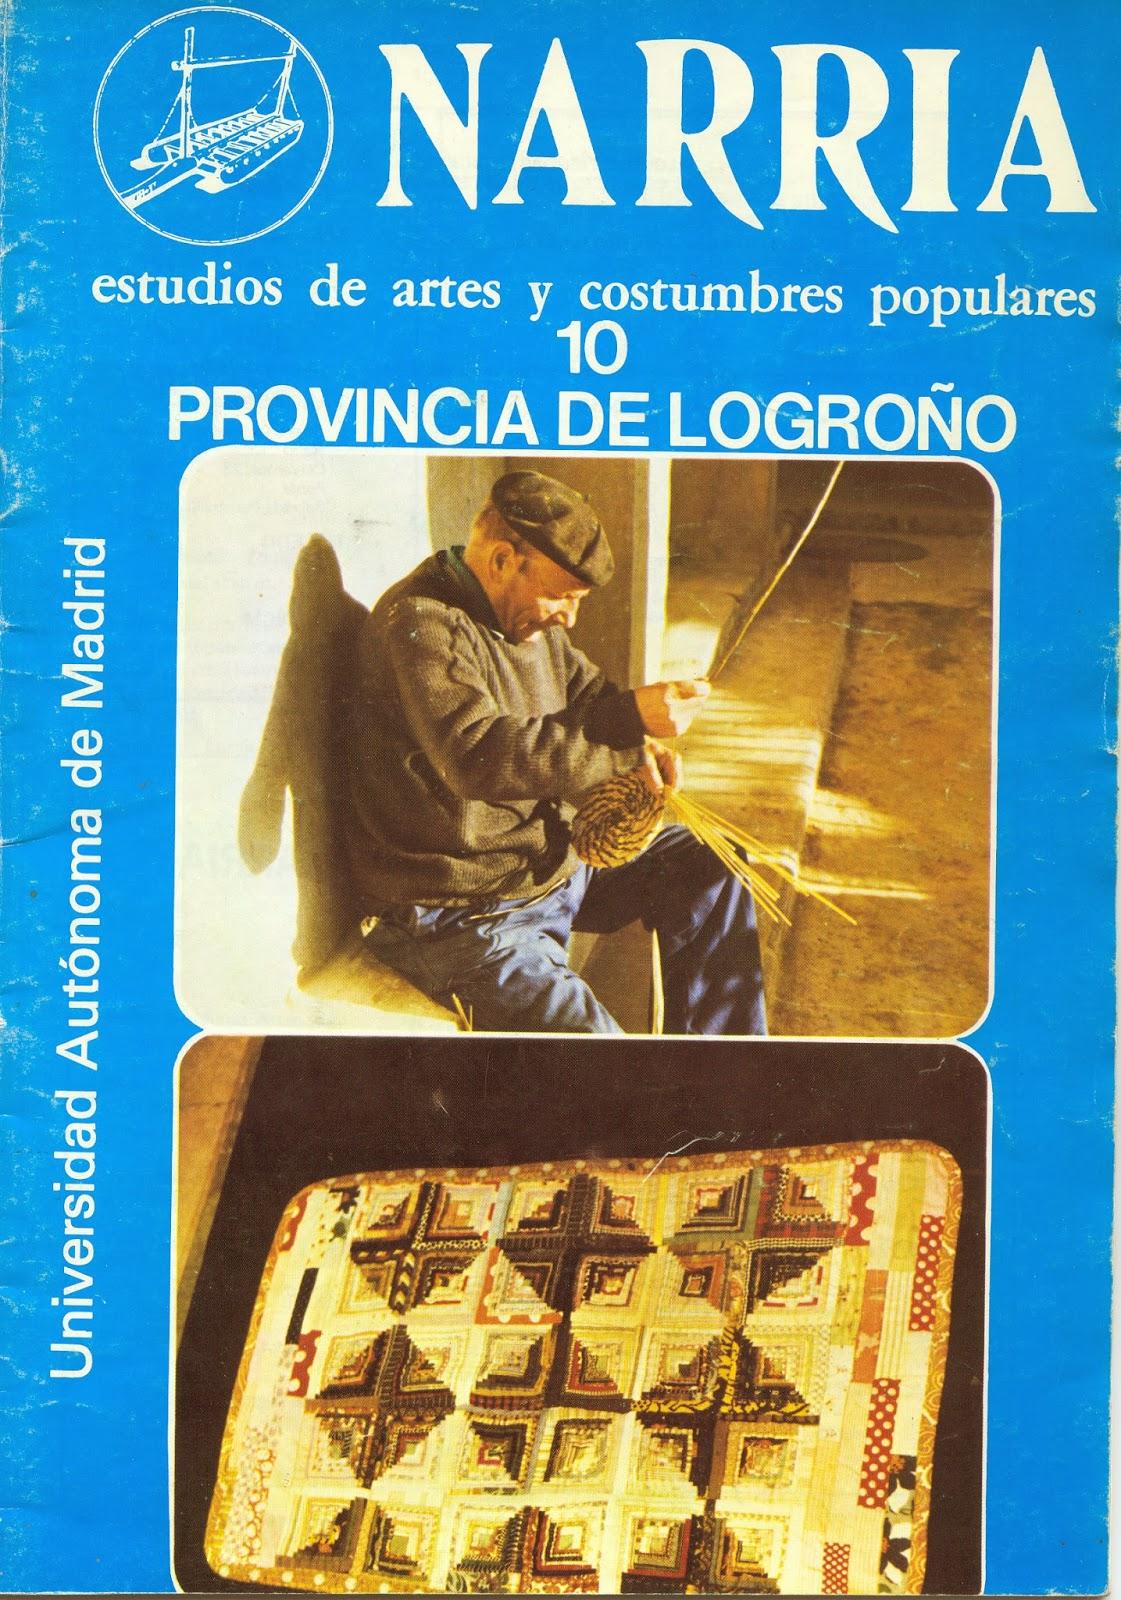 """Revista Narria. Estudio de artes y costumbres populares"""